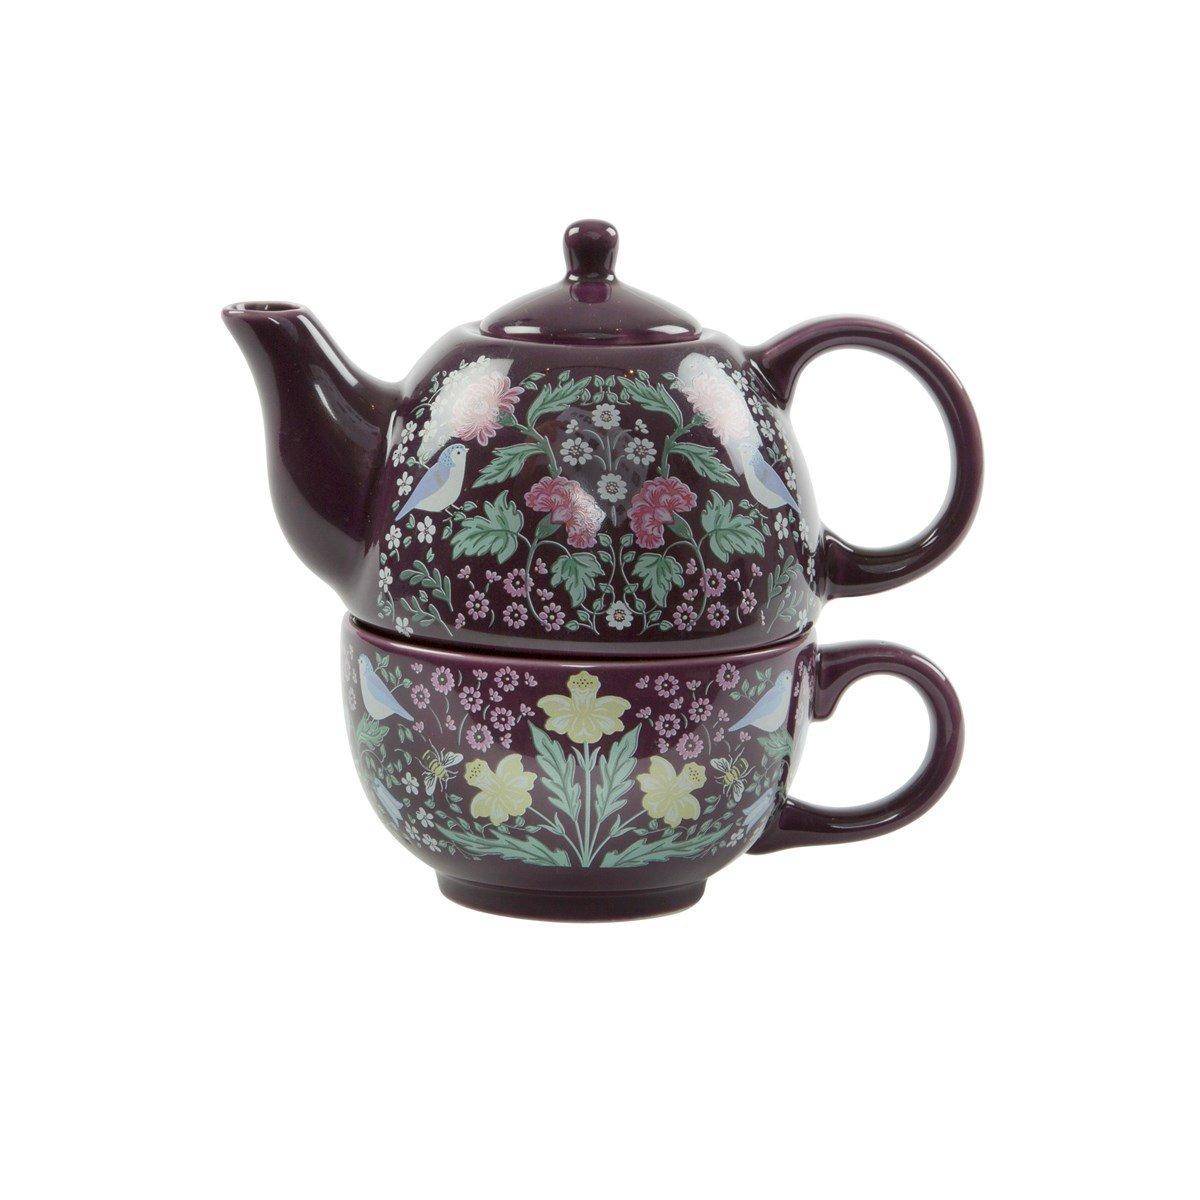 Sass & Belle Midnight Garden Tea for one Tea set William Morris Arts & Crafts style